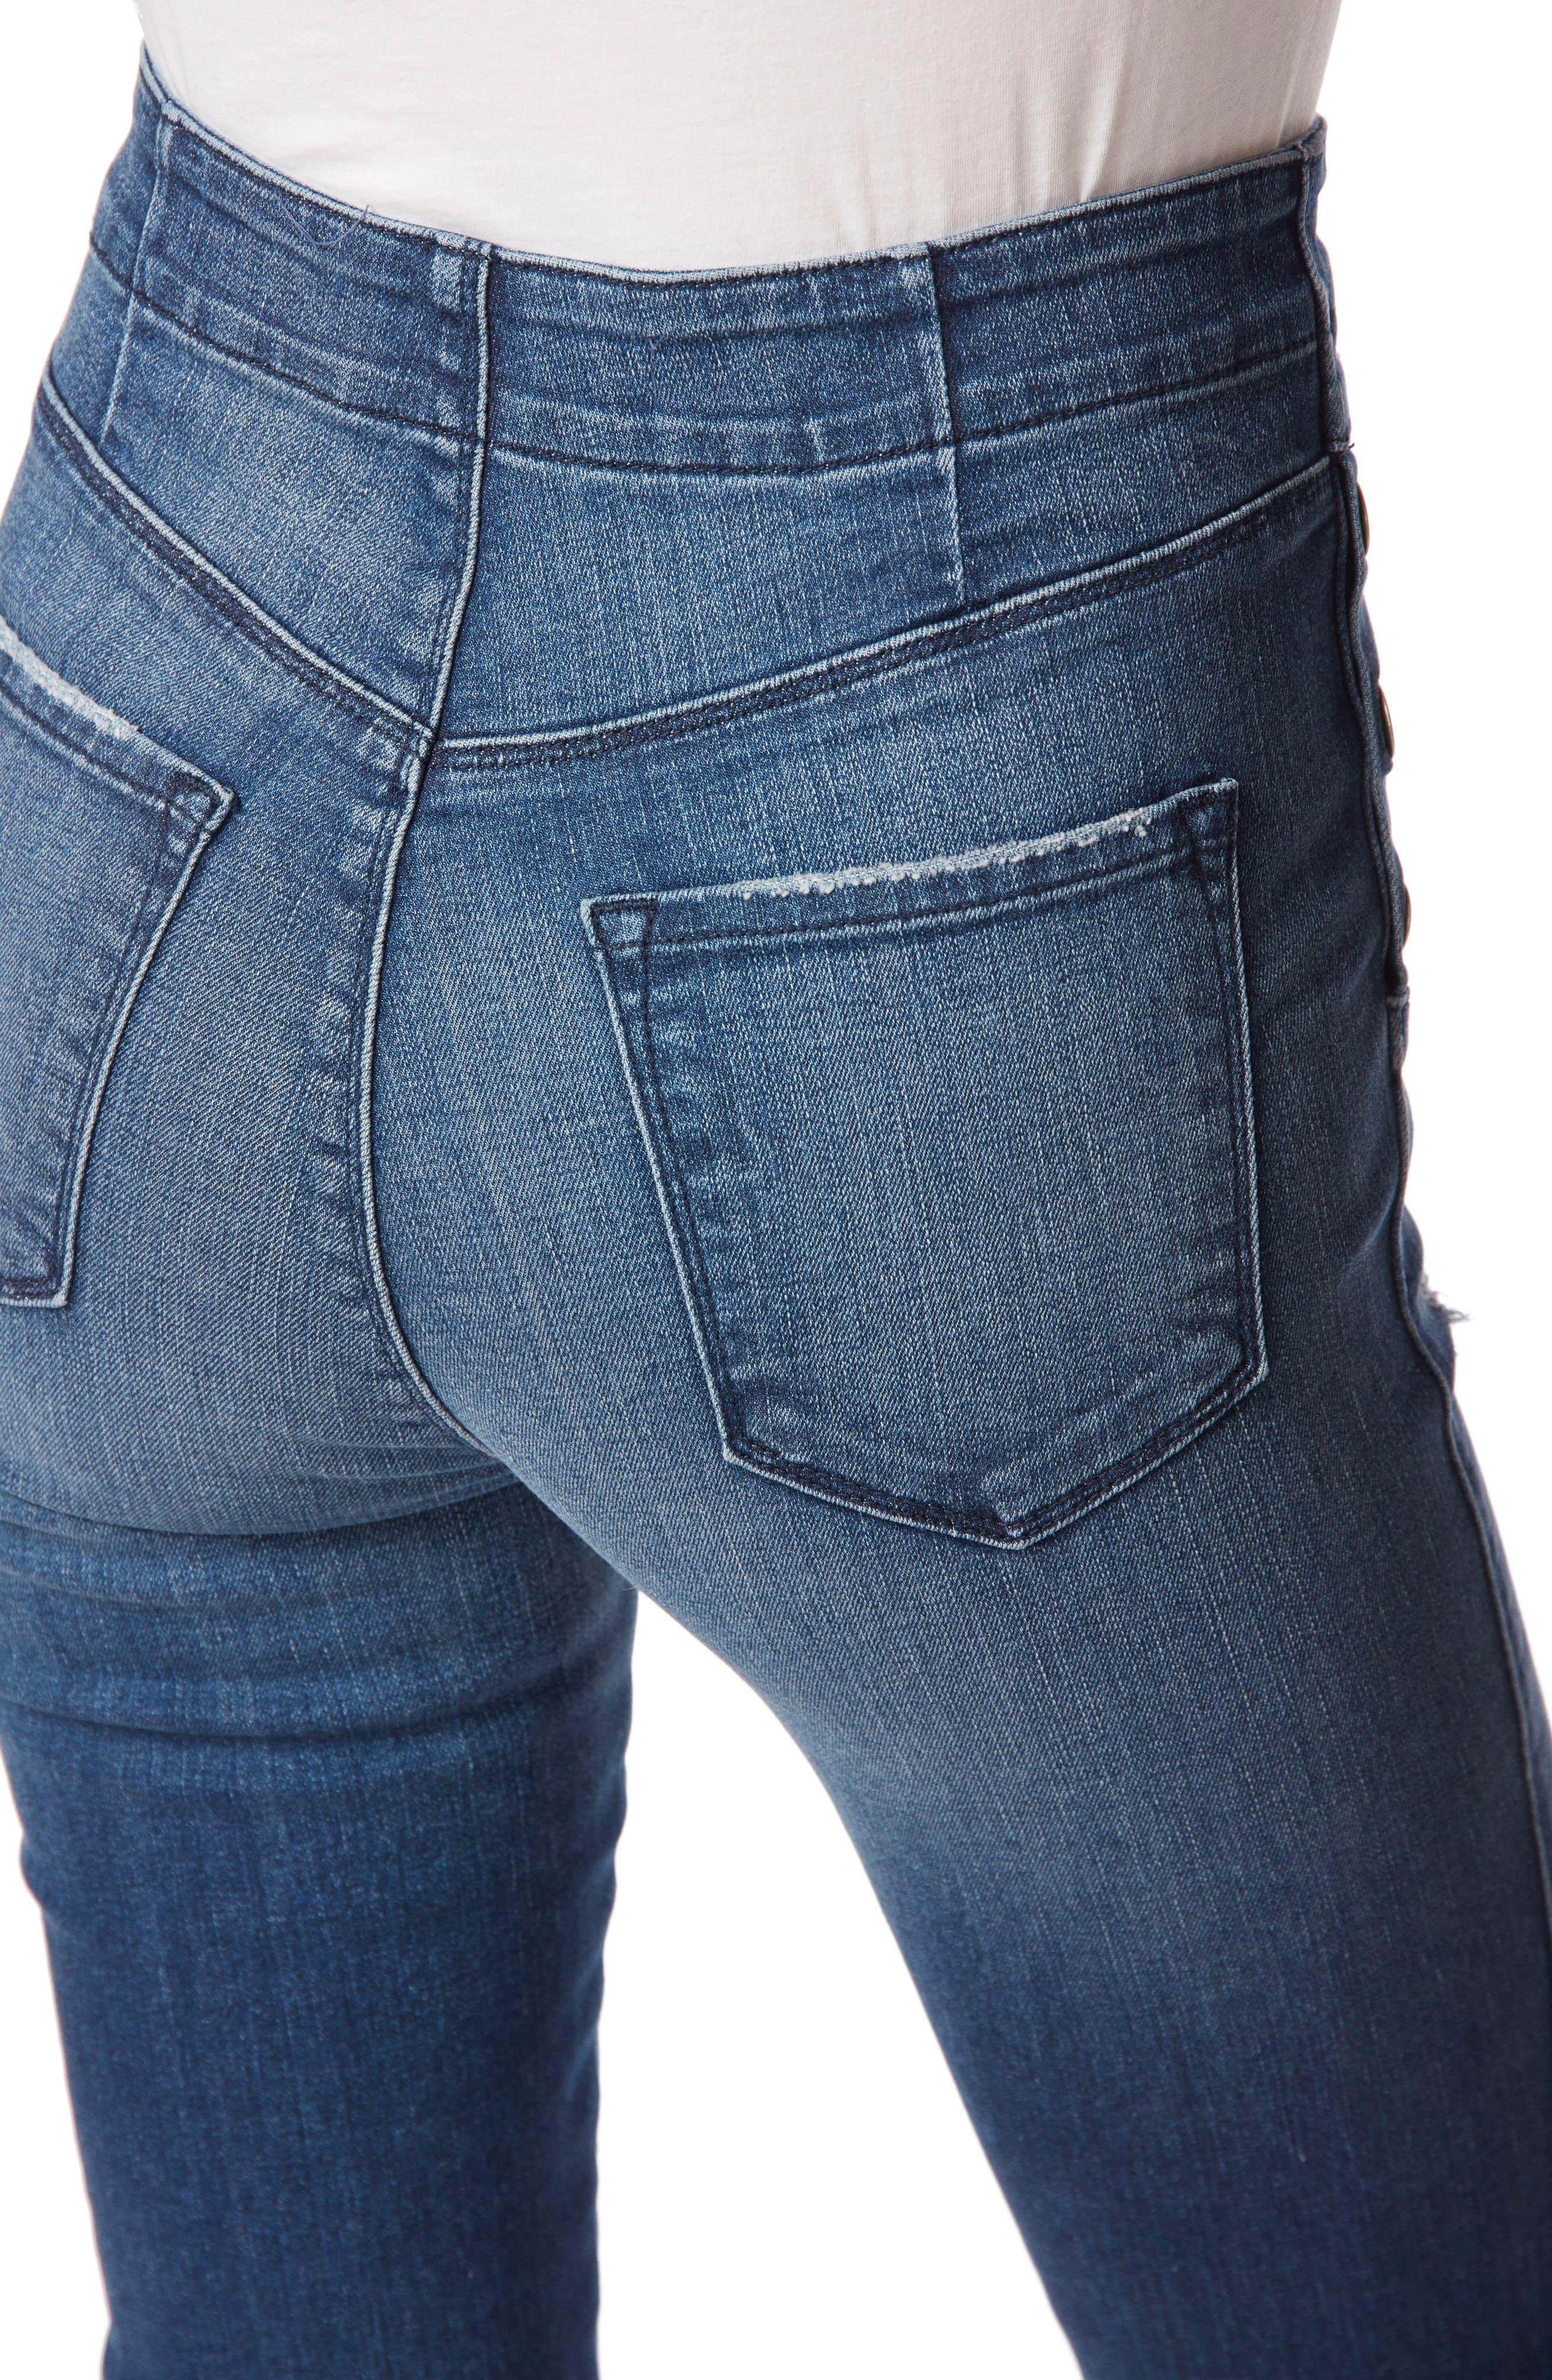 Natasha Sky High High Waist Skinny Jeans,                             Alternate thumbnail 6, color,                             234